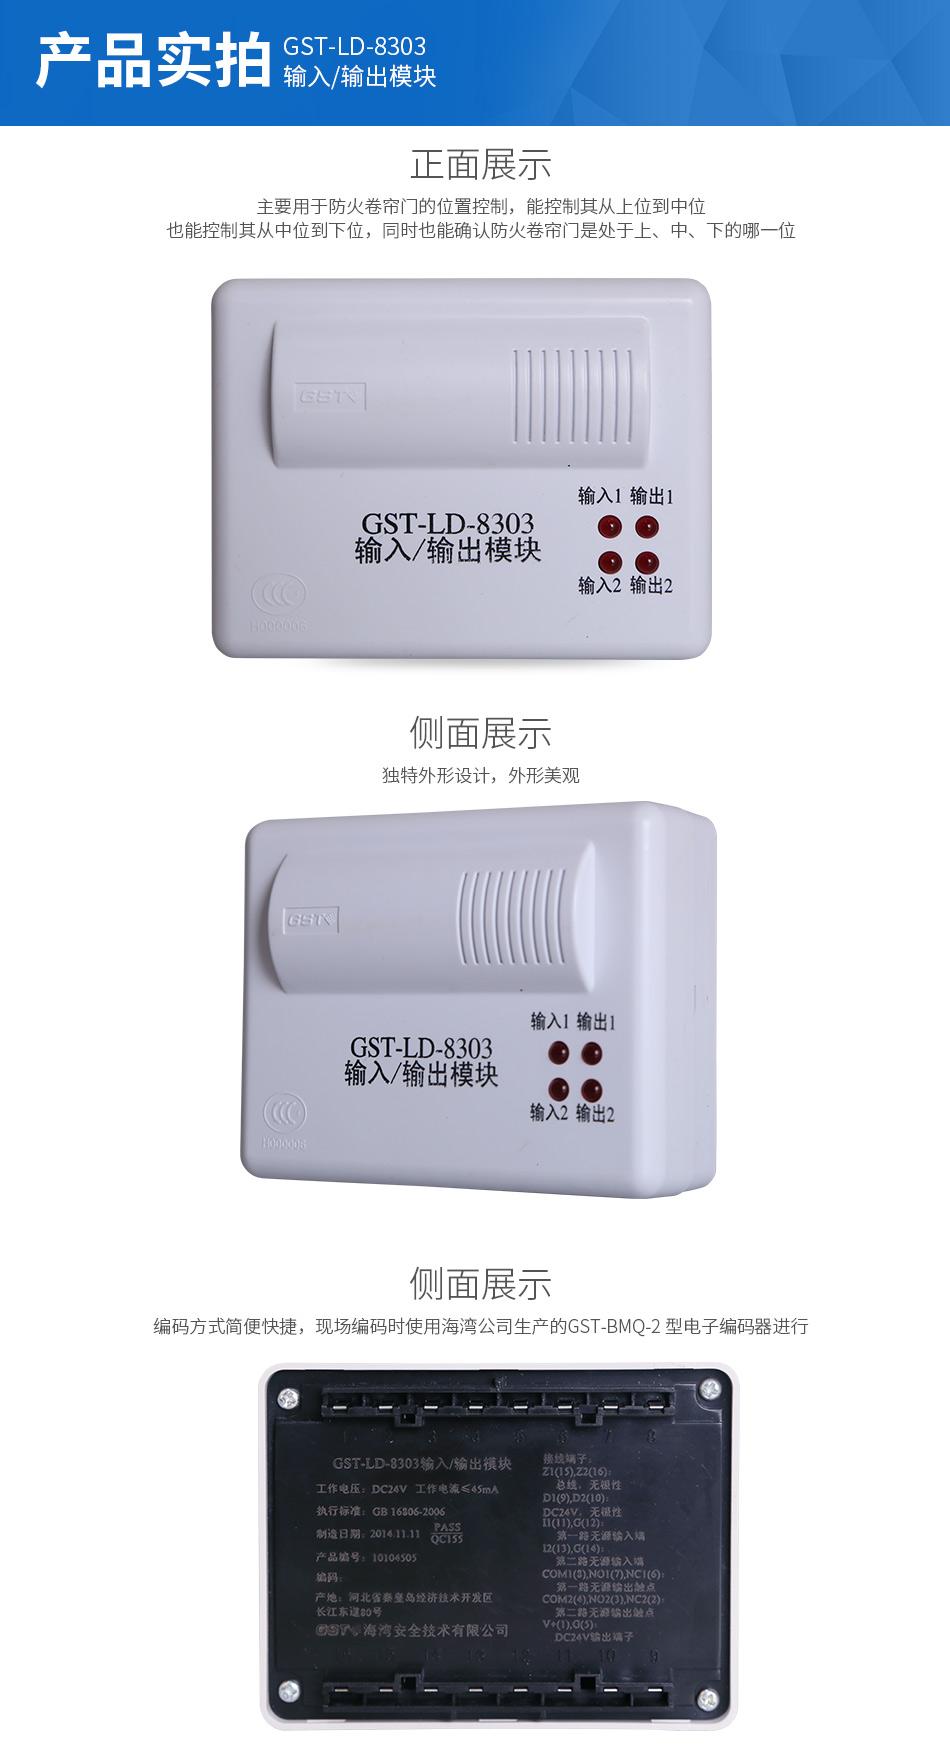 GST-LD-8303输入输出模块产品实拍图